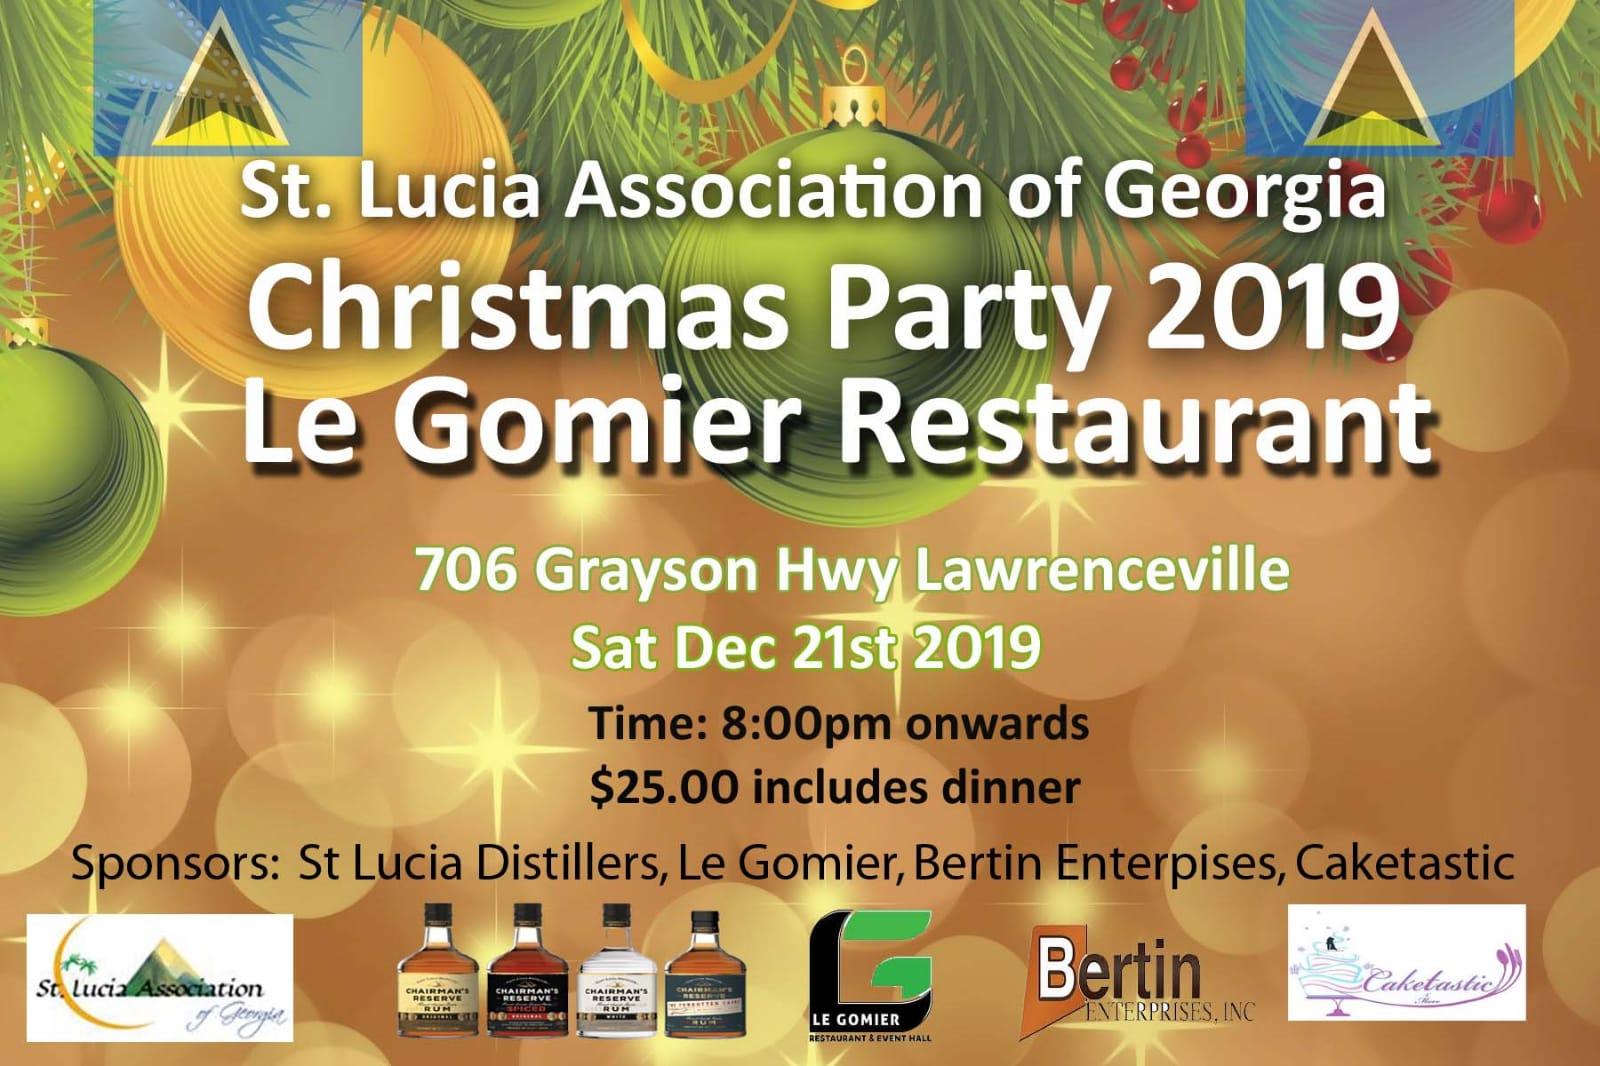 SLUAG Christmas Party 2019